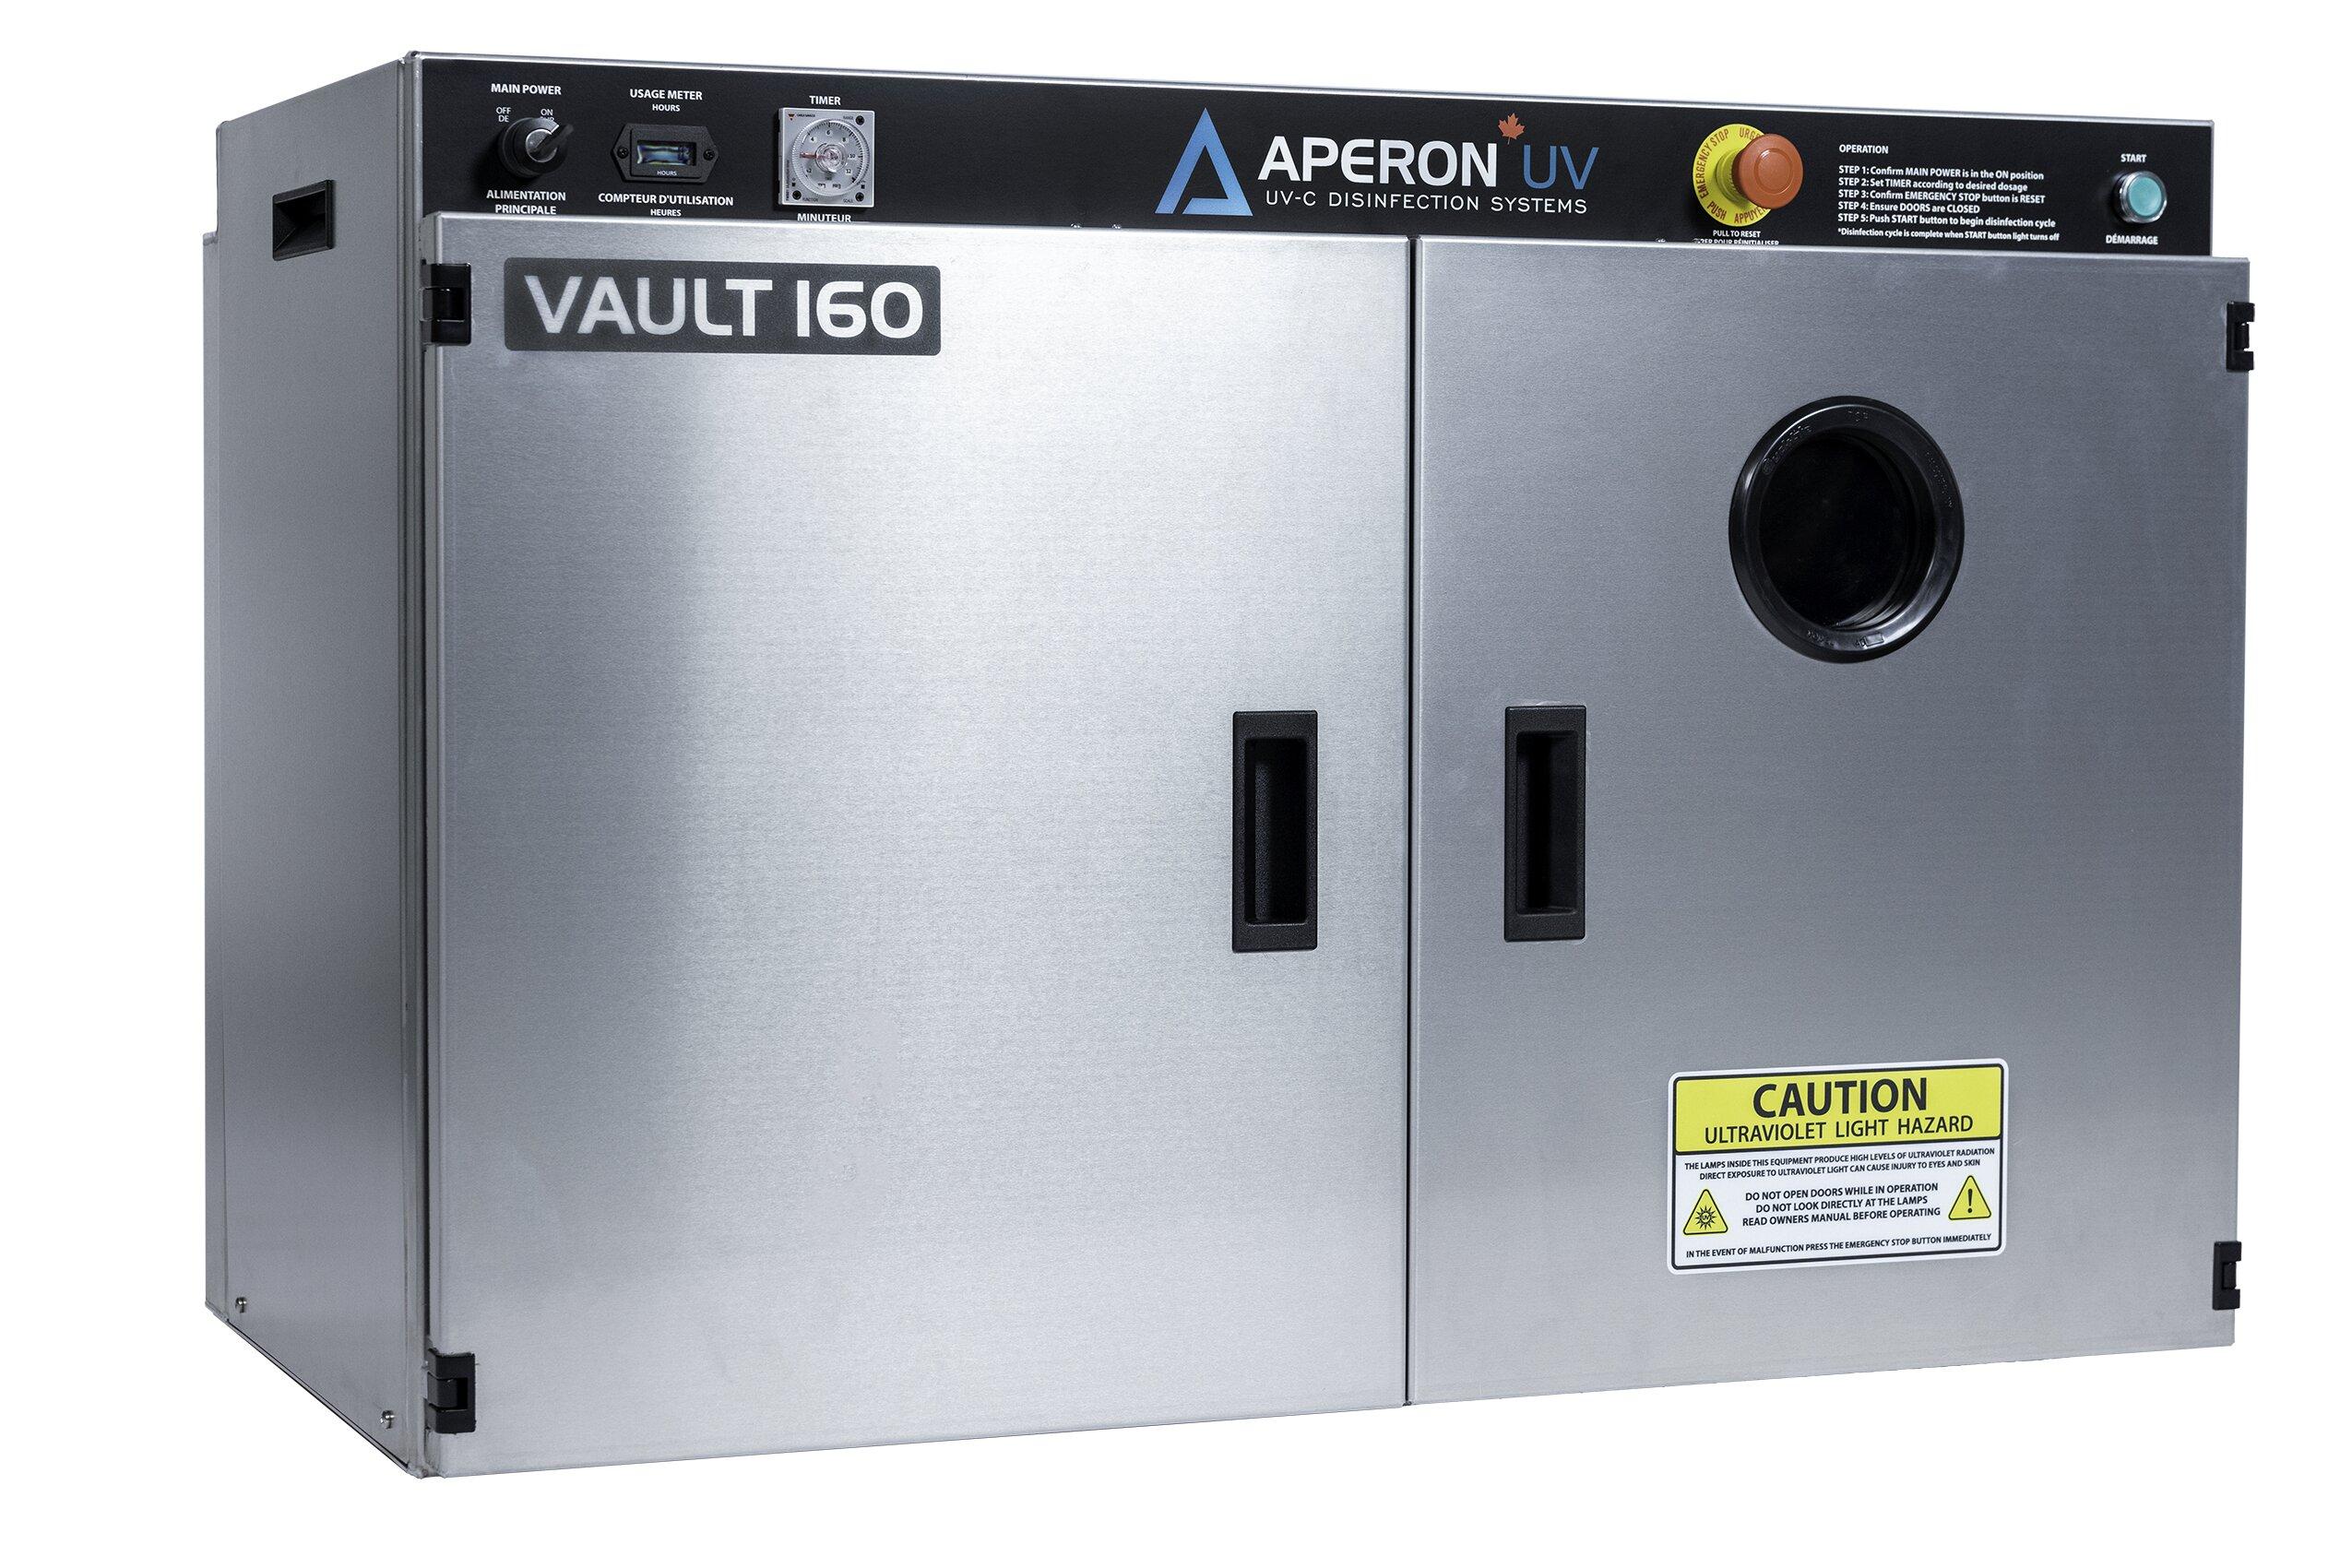 Aperon Vault 160 - MEDITEK